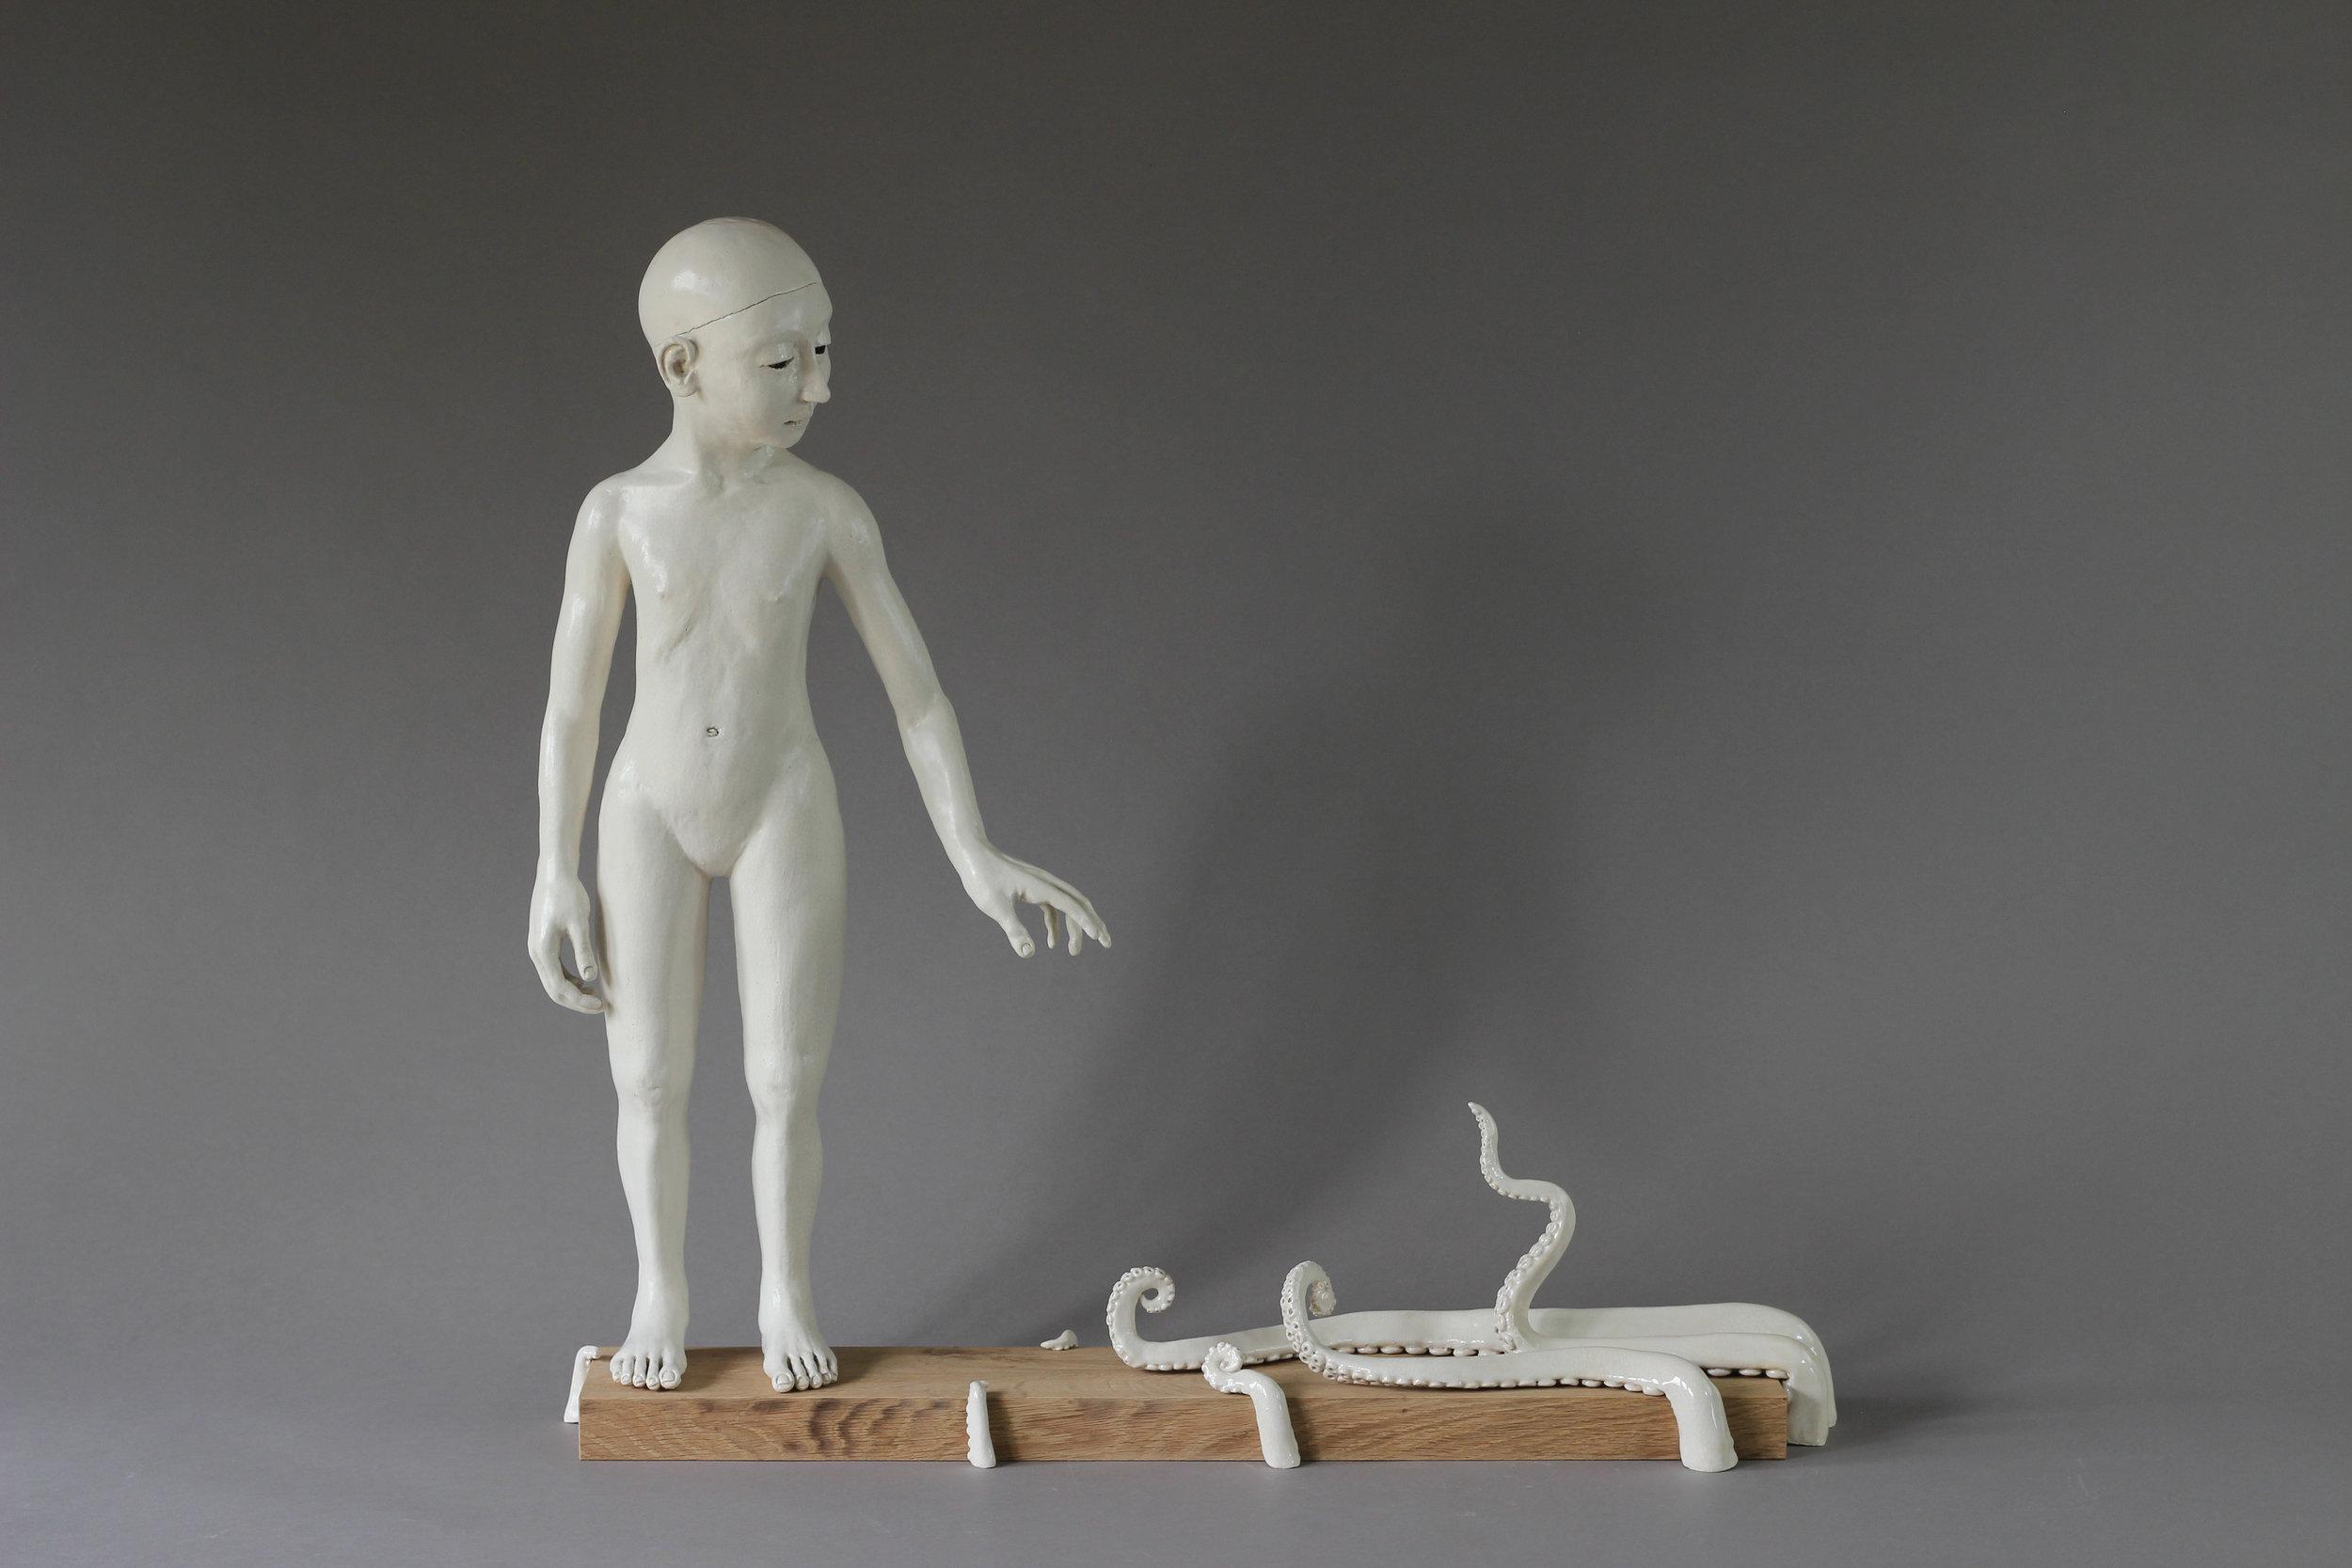 Alison Coaten : Haptic